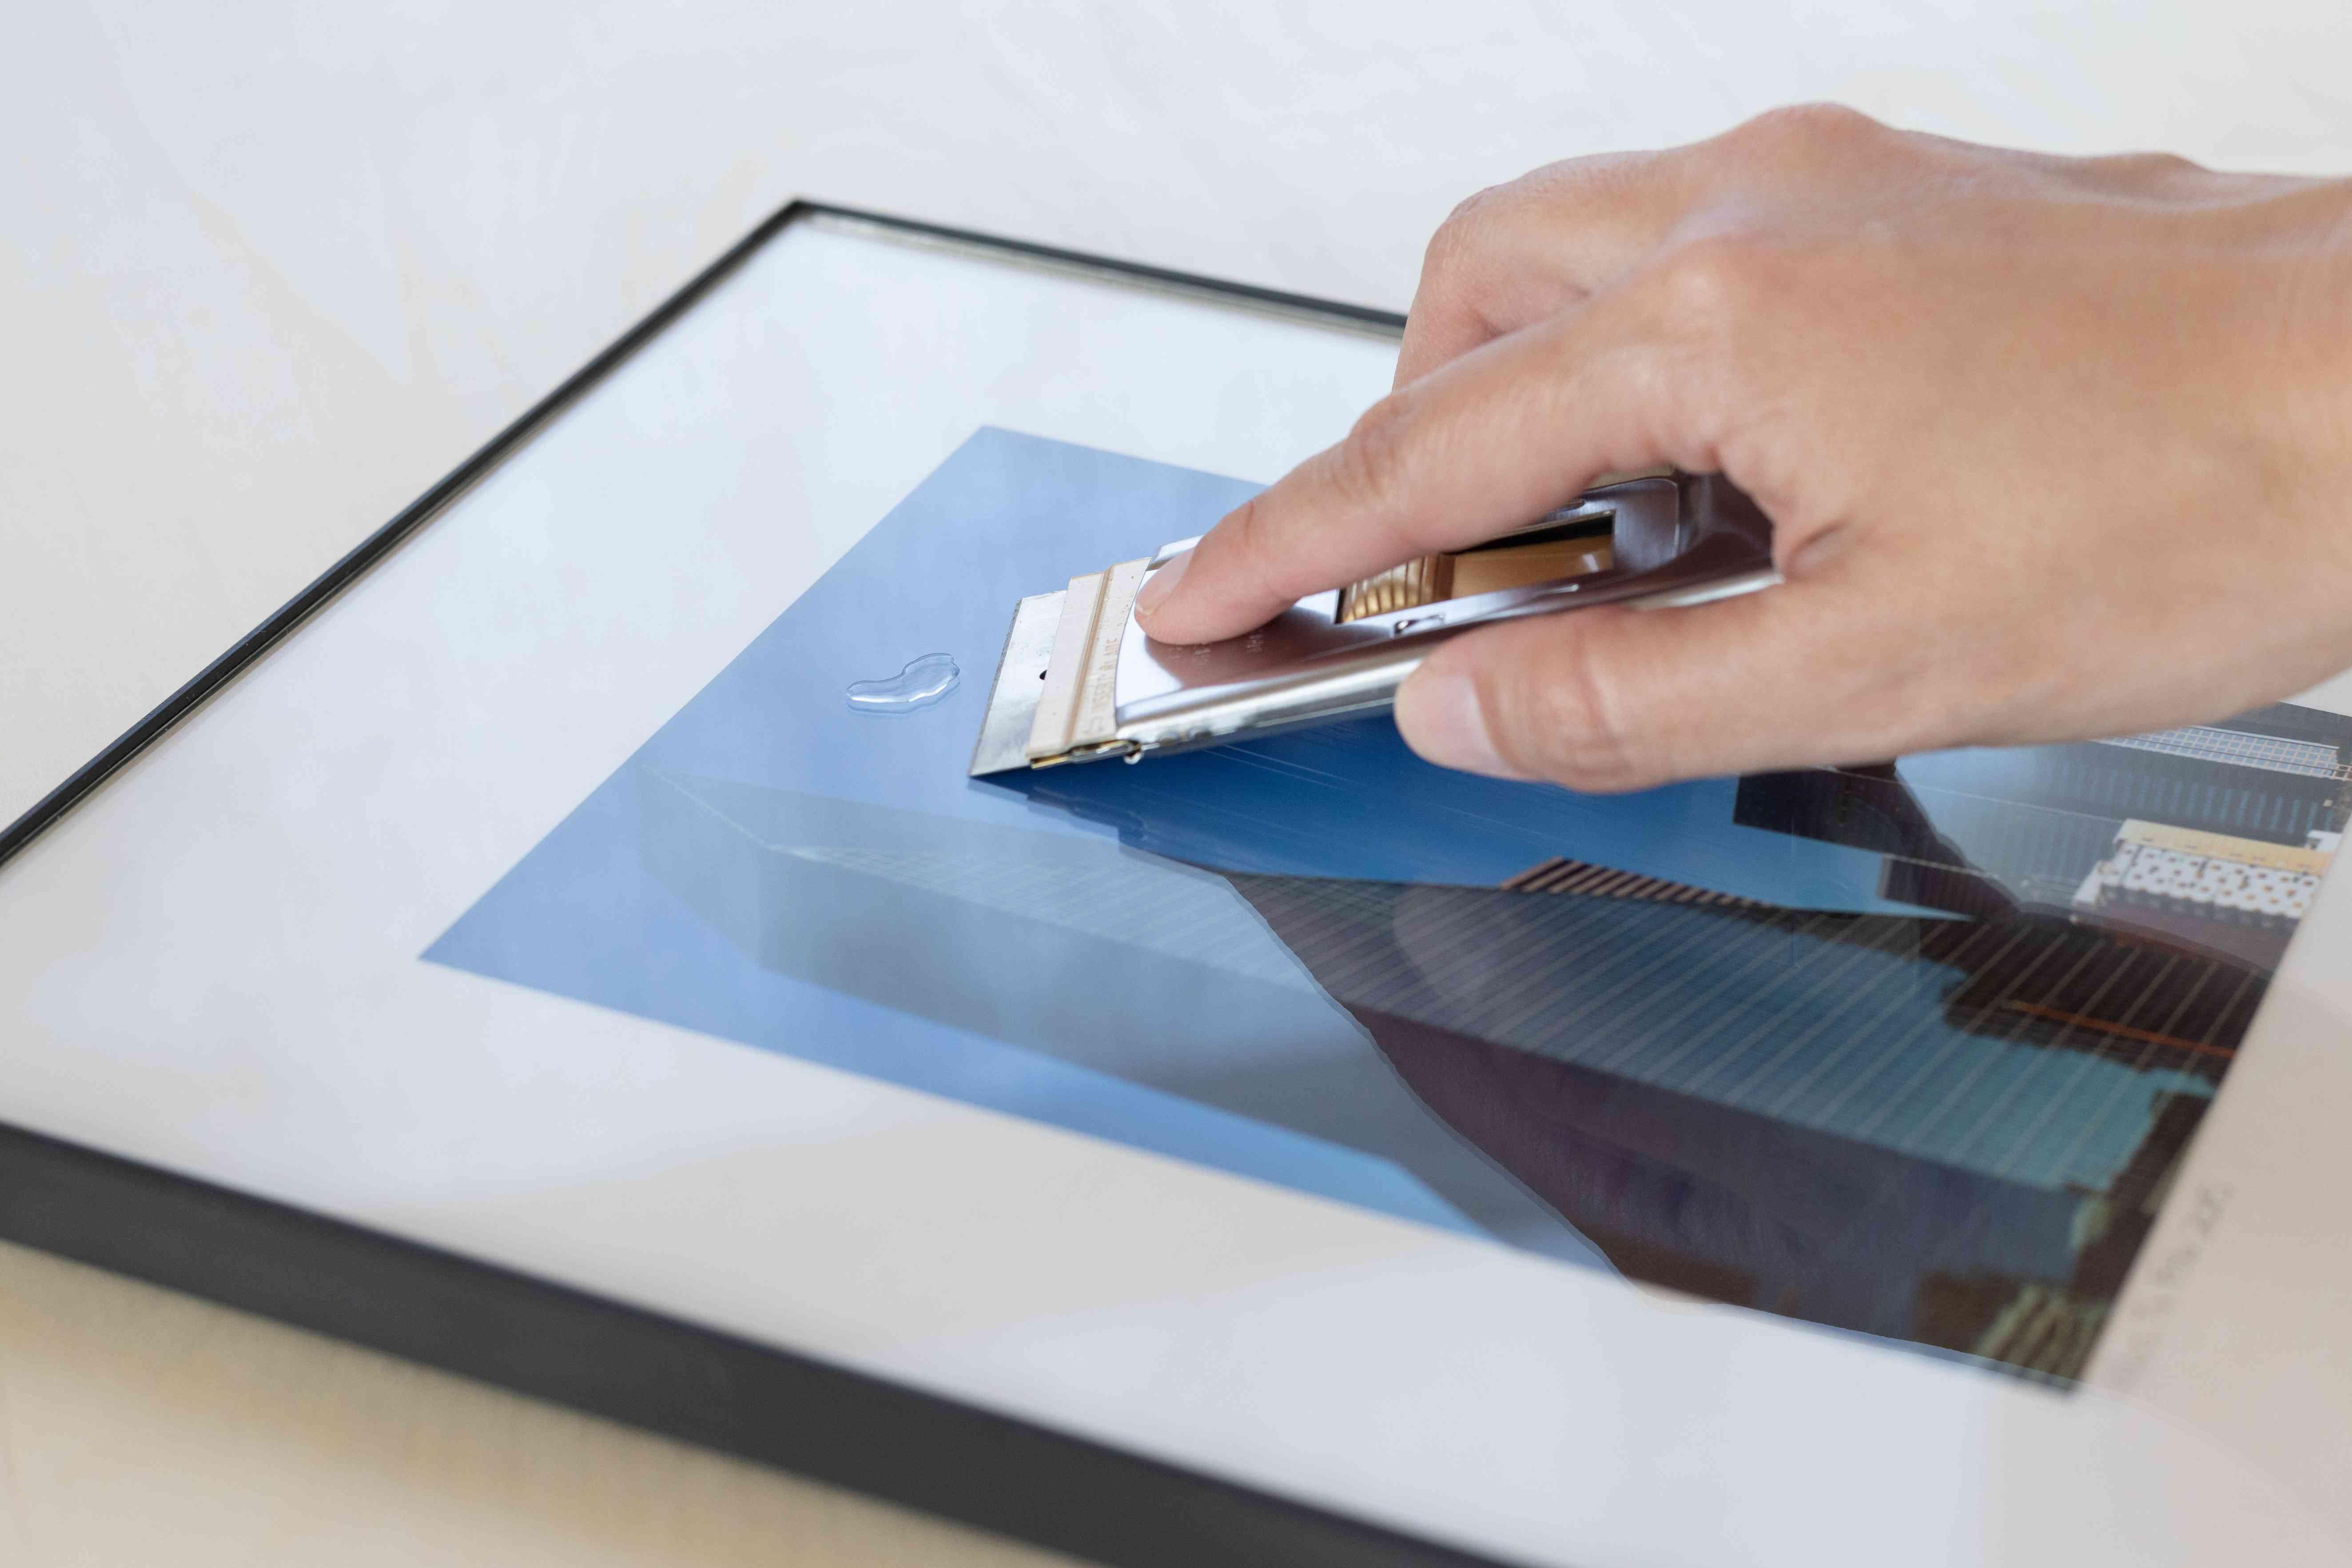 Safety razor scraper peeling off super glue from picture frame